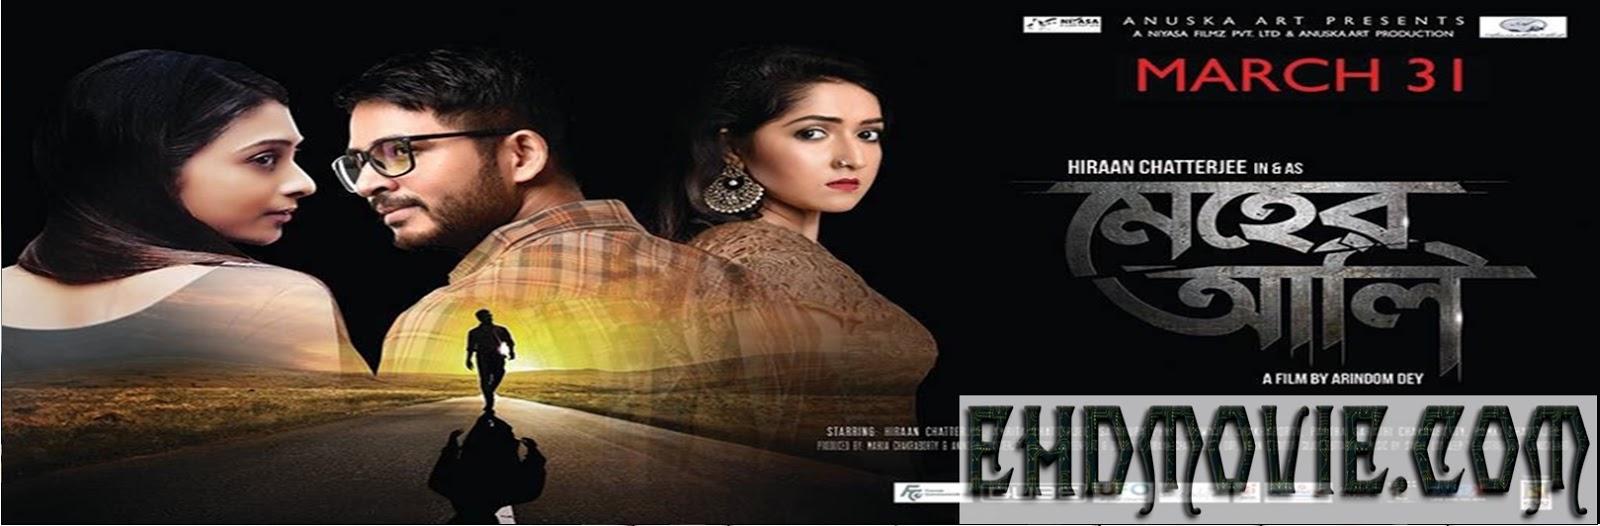 Meher Aali 2017 Bengali Full Movie Original 720p ORG WEB-DL 750MB - 1.3GB